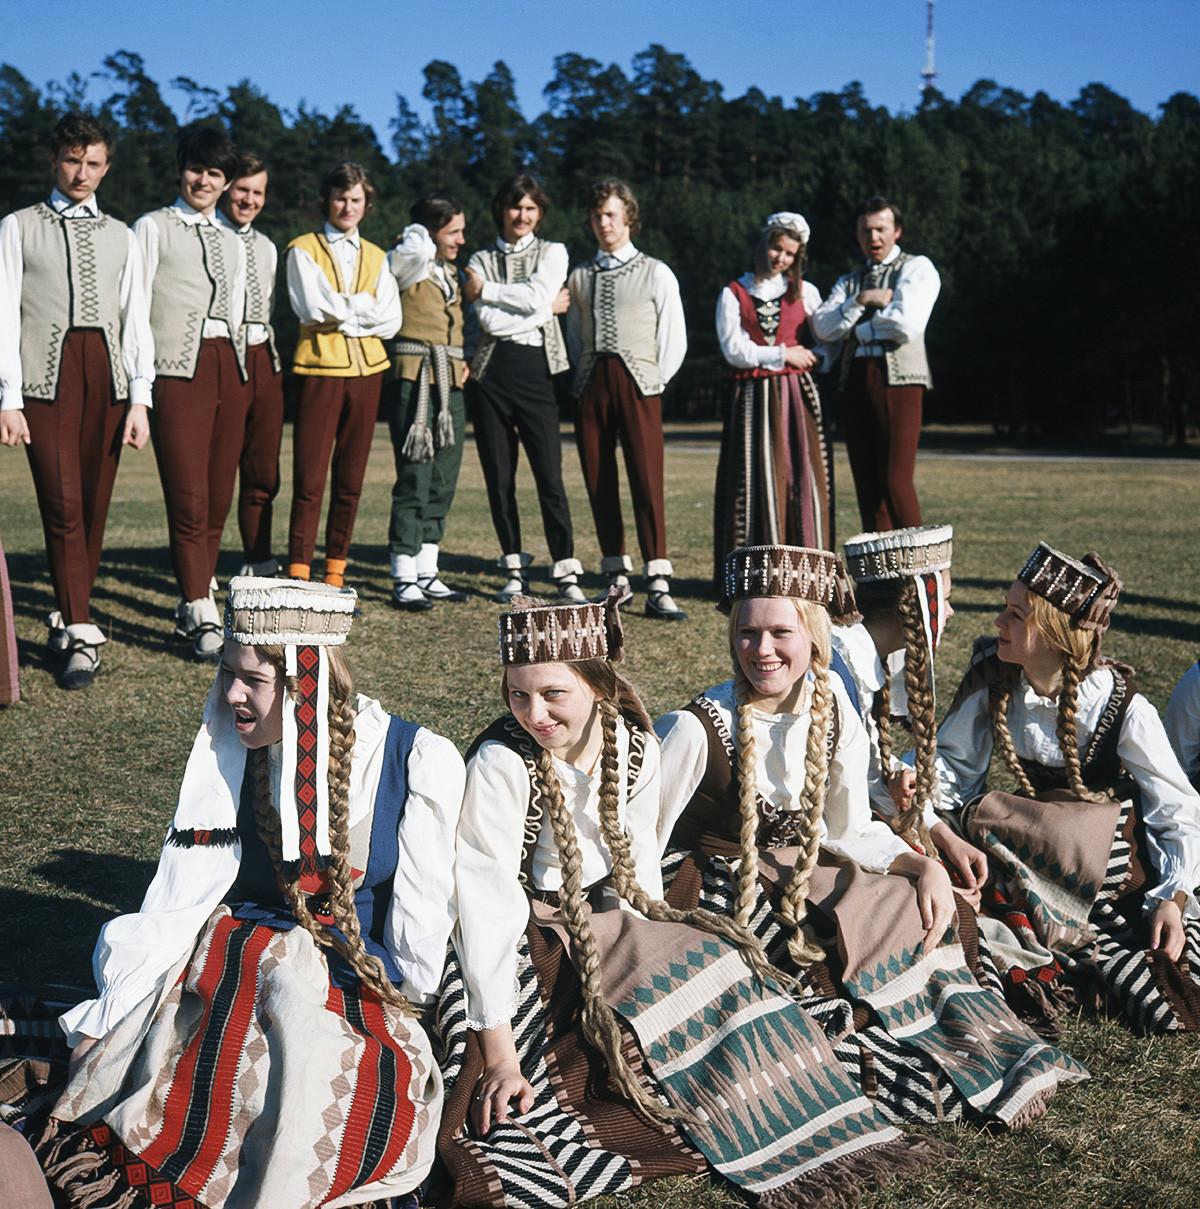 1974. Чланови ансамбла народног плеса и песме Вилњуског државног универзитета